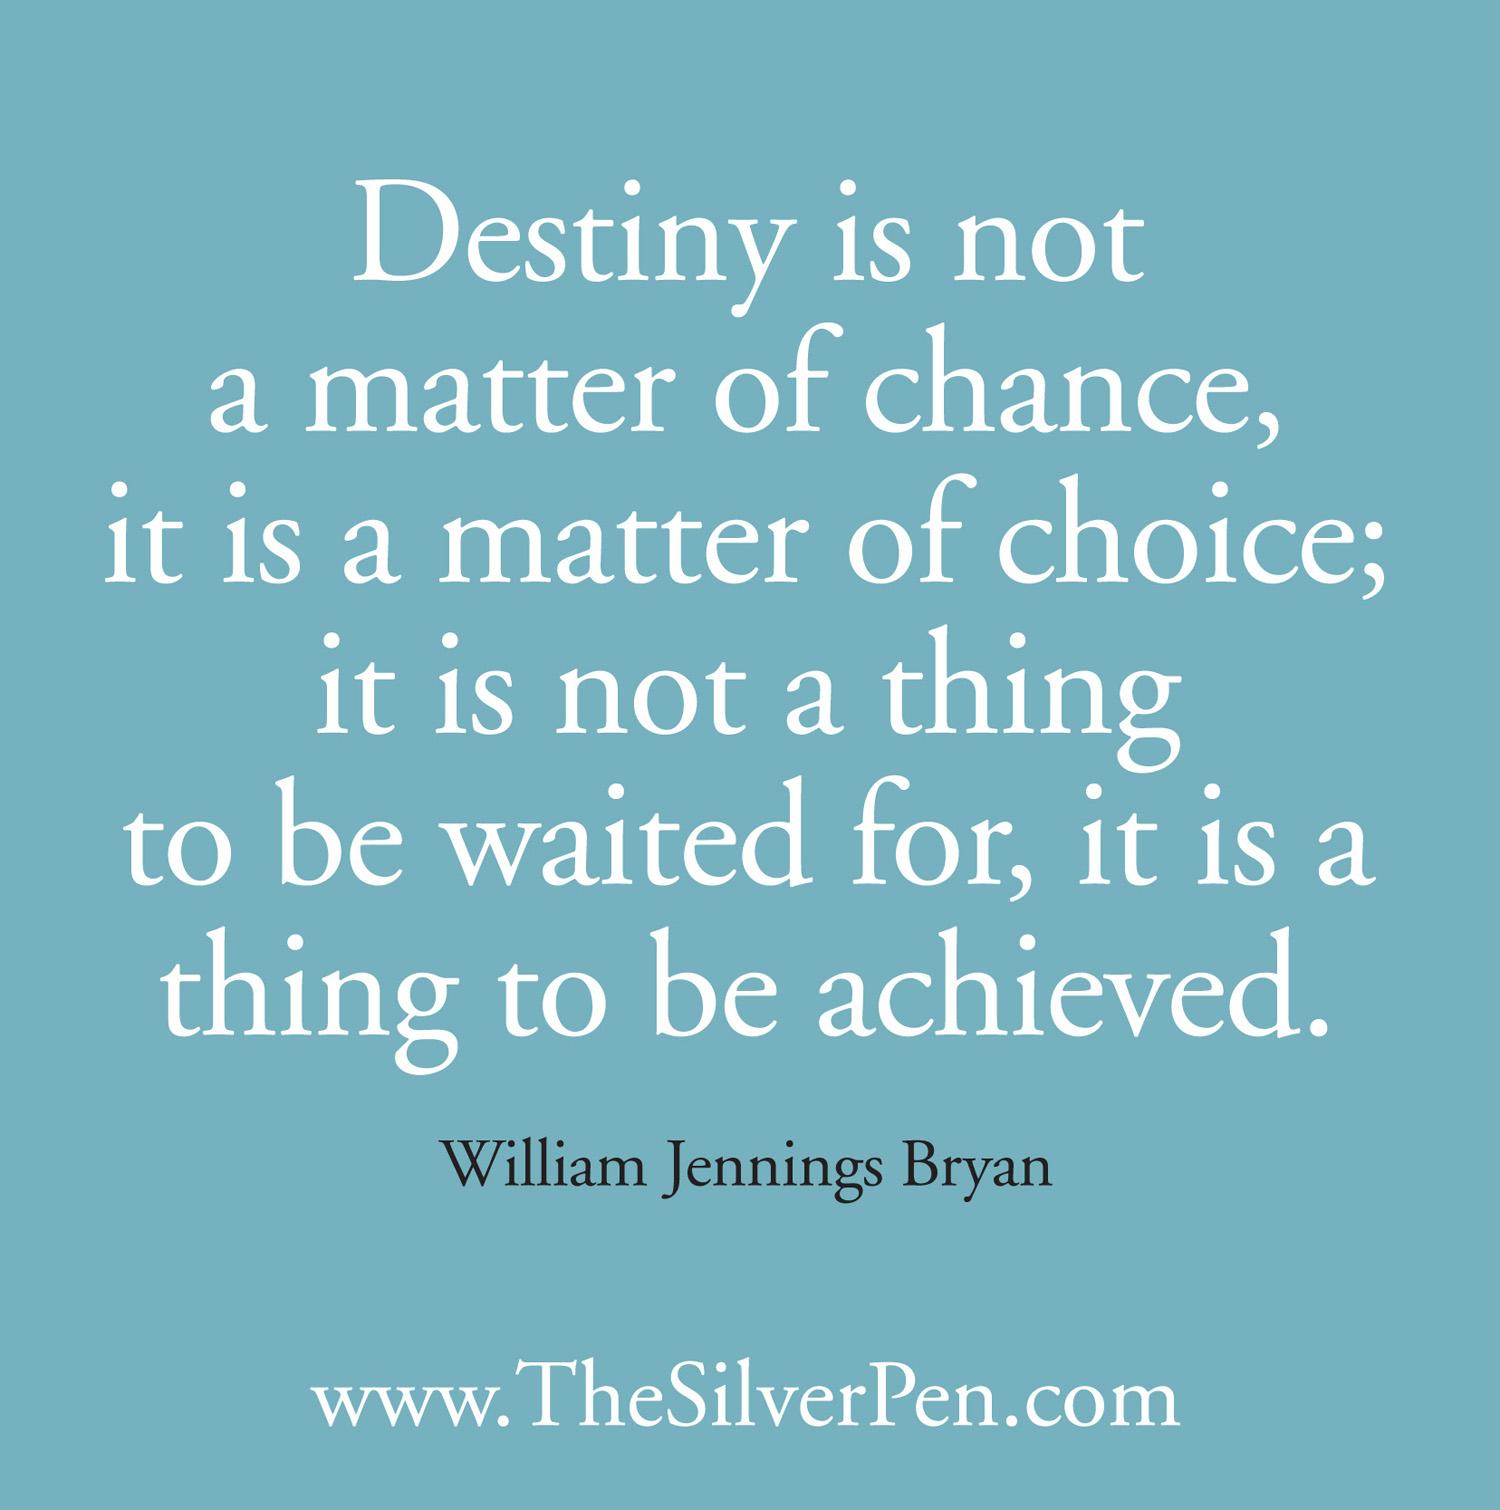 Follow Your Destiny Quotes. QuotesGram